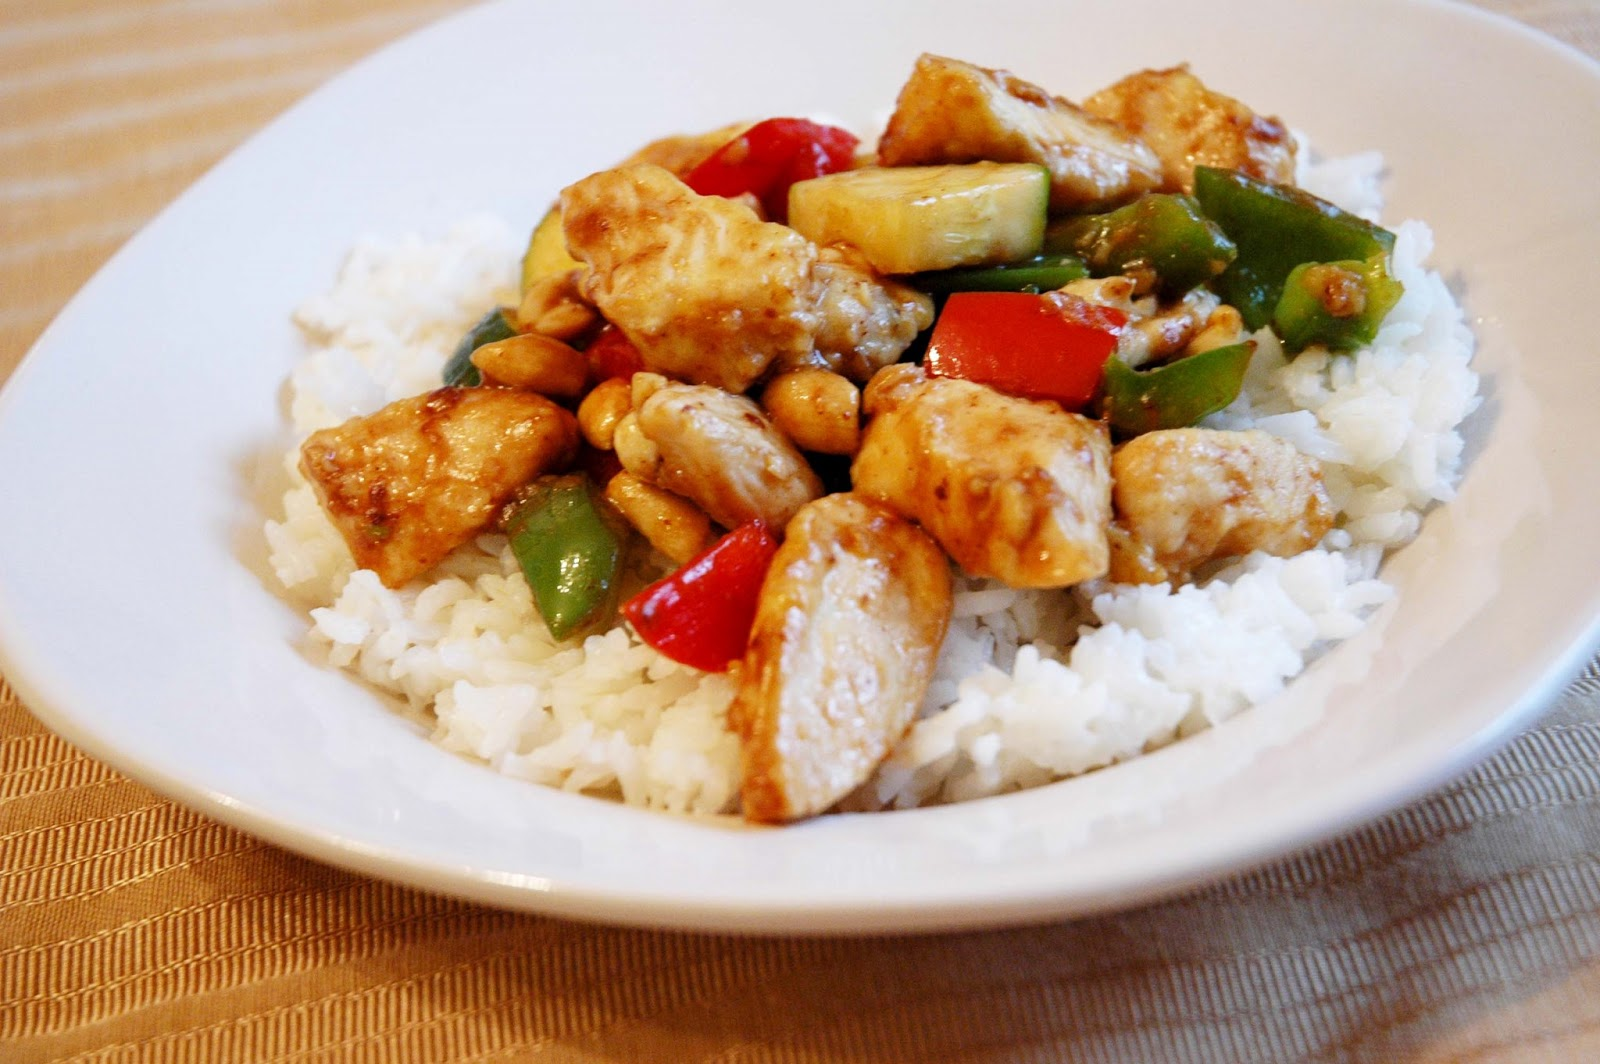 Seven Bum Kitchen: Panda Express Kung Pao Chicken